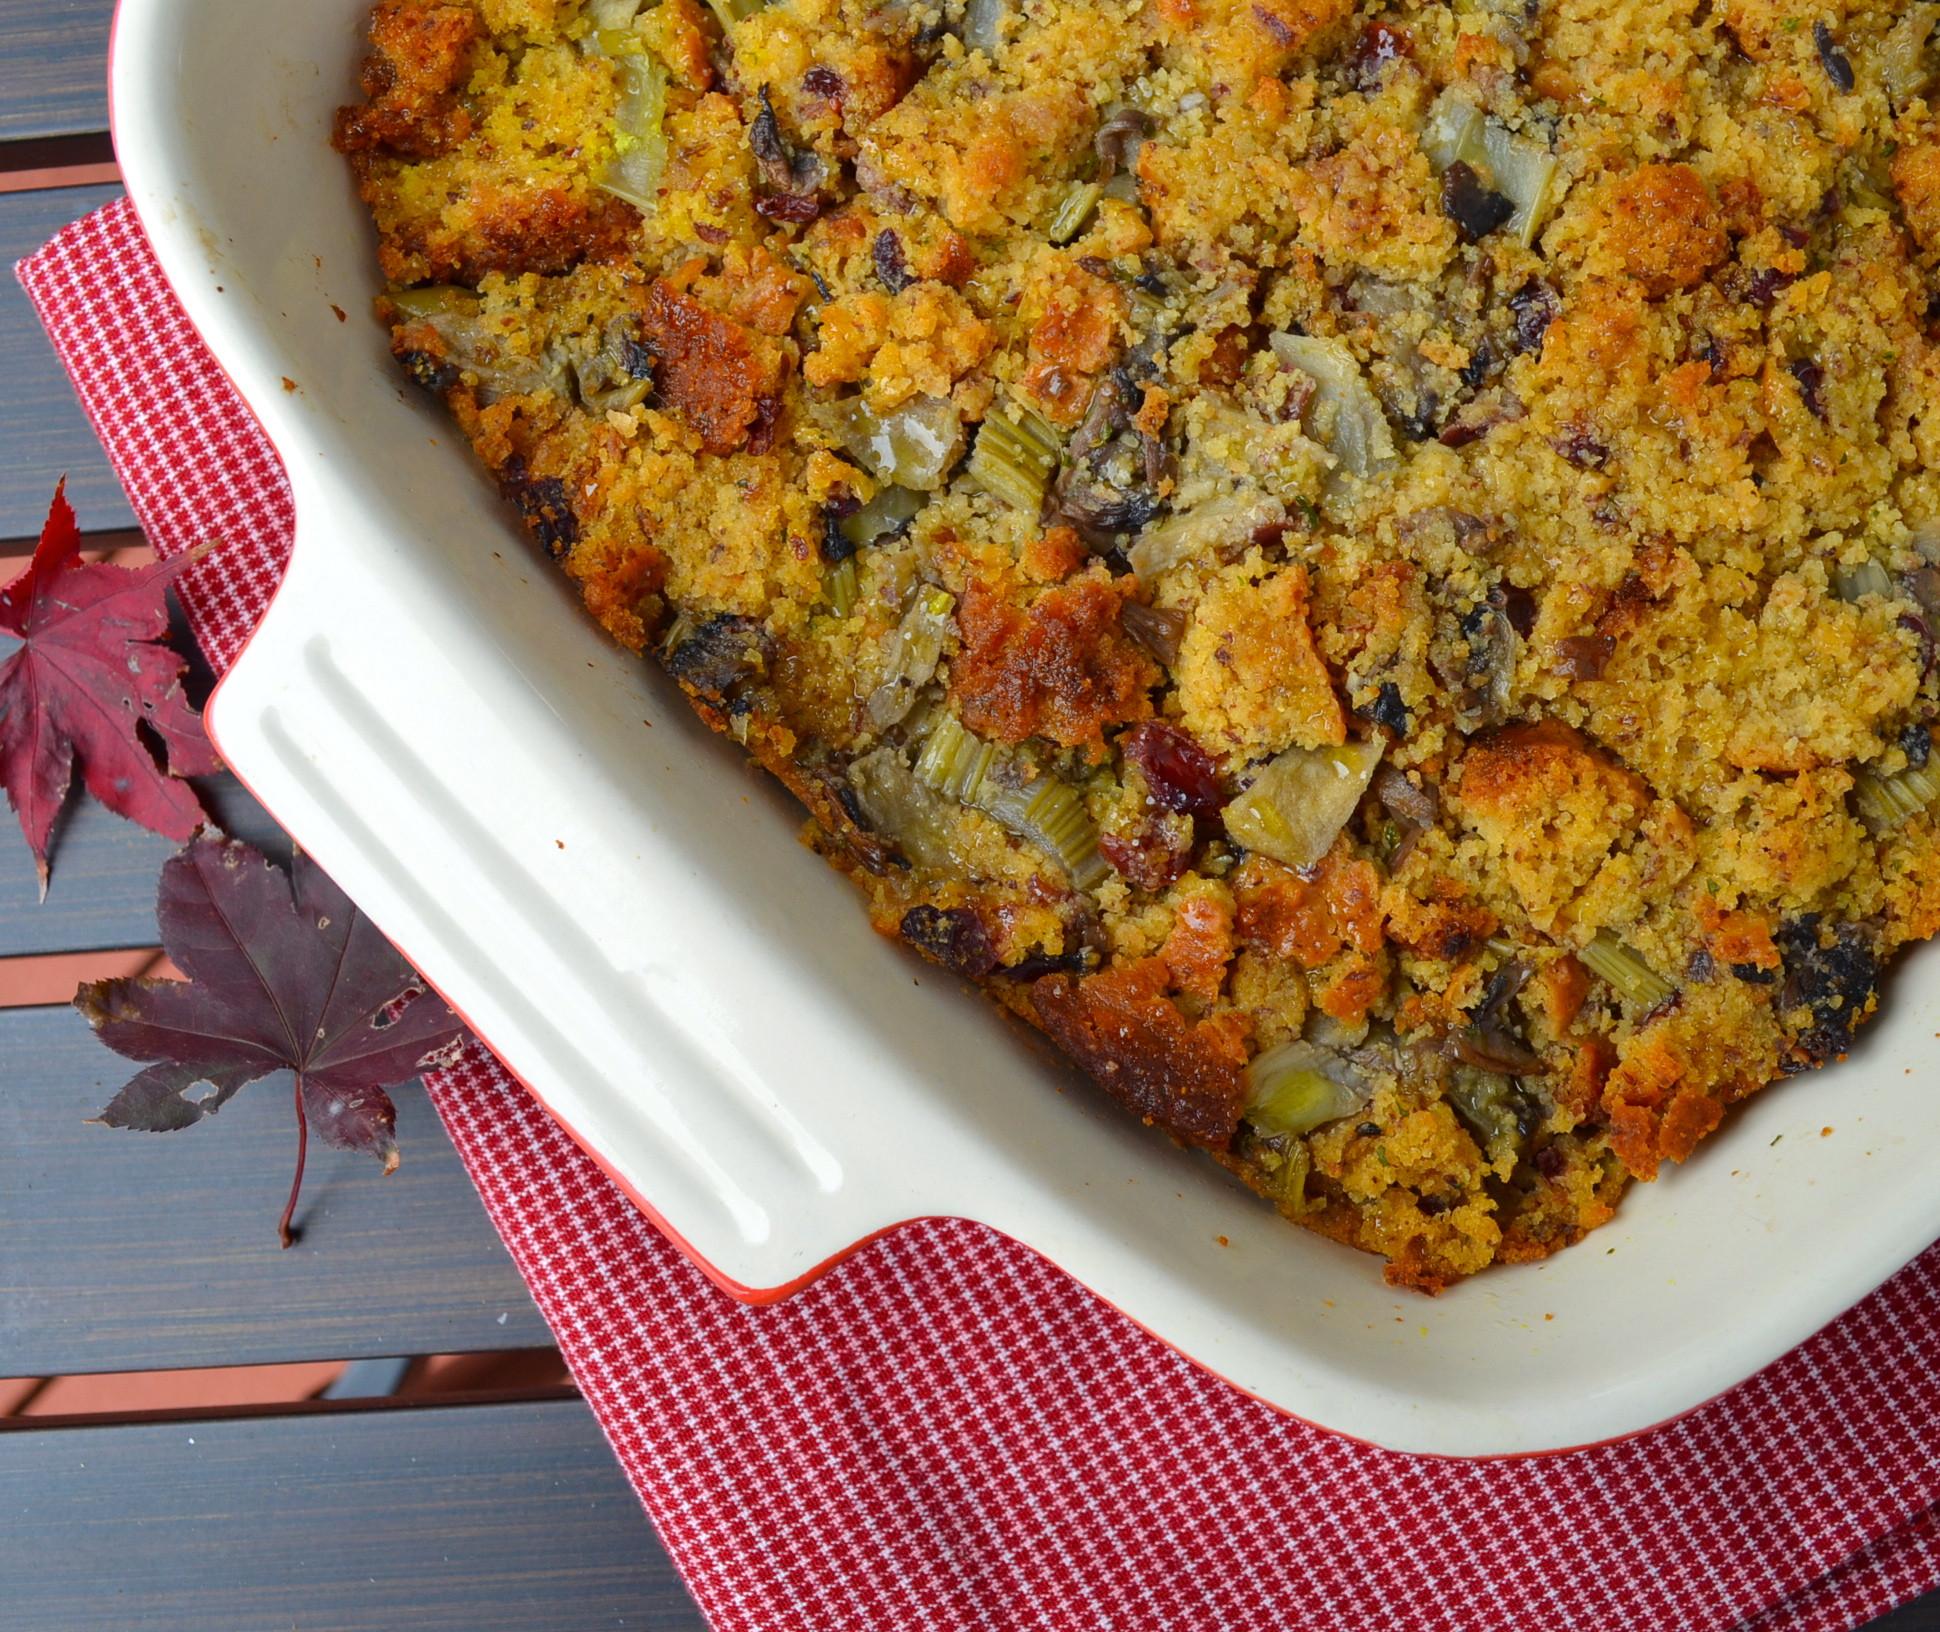 Vegan Stuffing Recipes Thanksgiving  Ideas For A Vegan Thanksgiving Part 4 Apple Chestnut